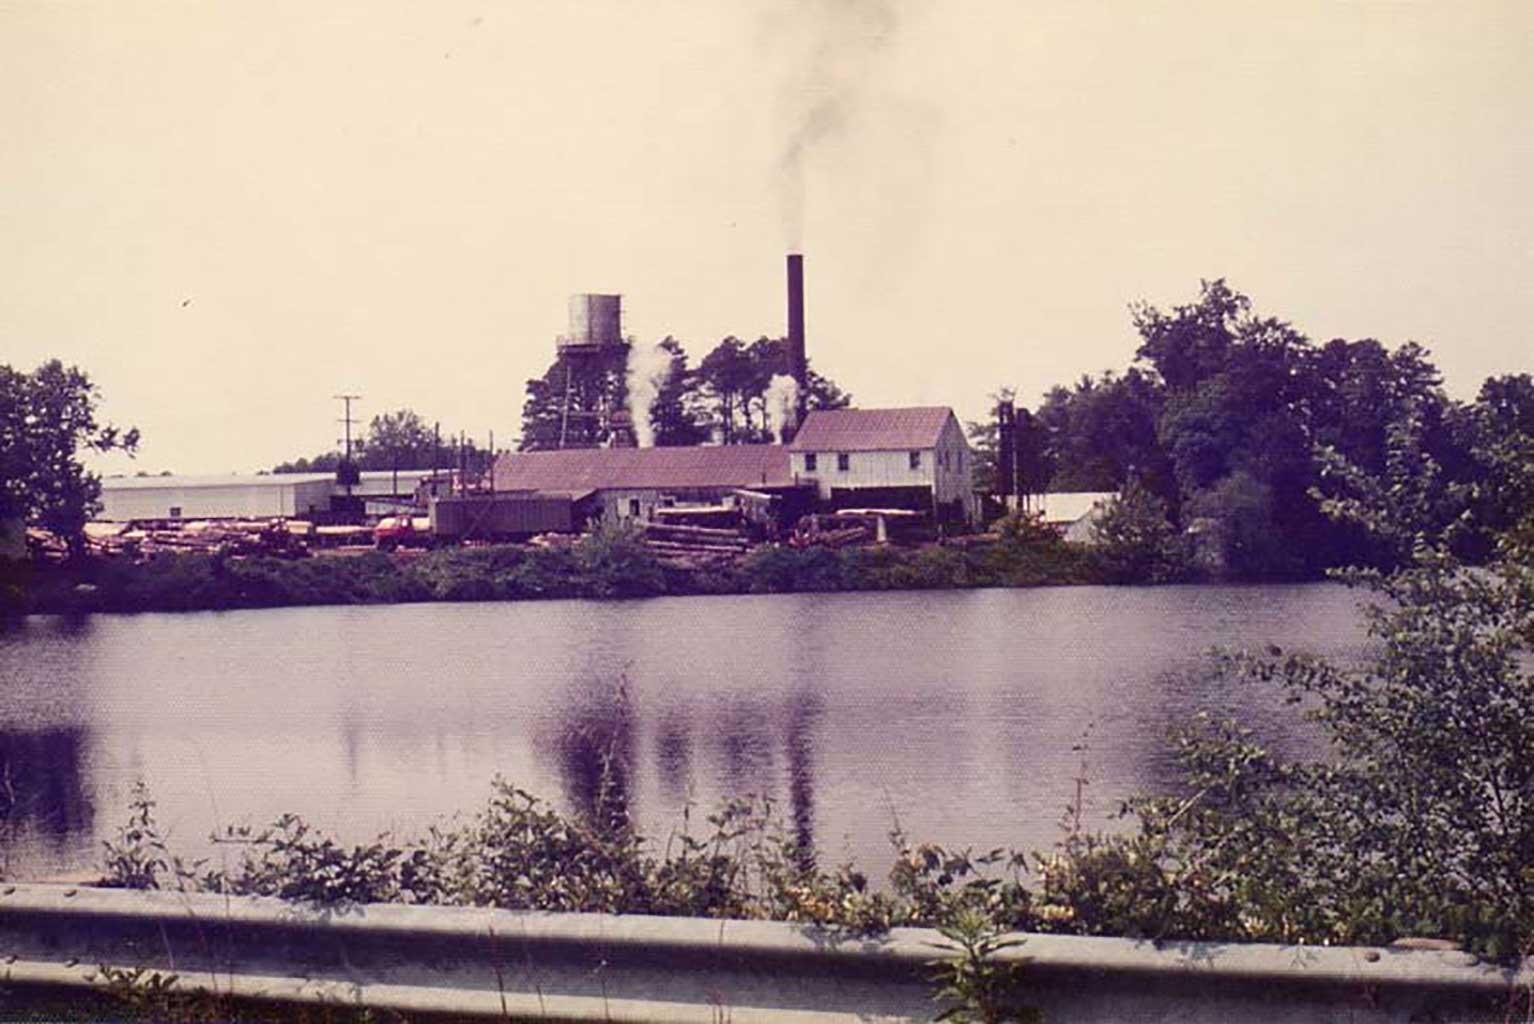 kirk-lumber-mill-1978-img263